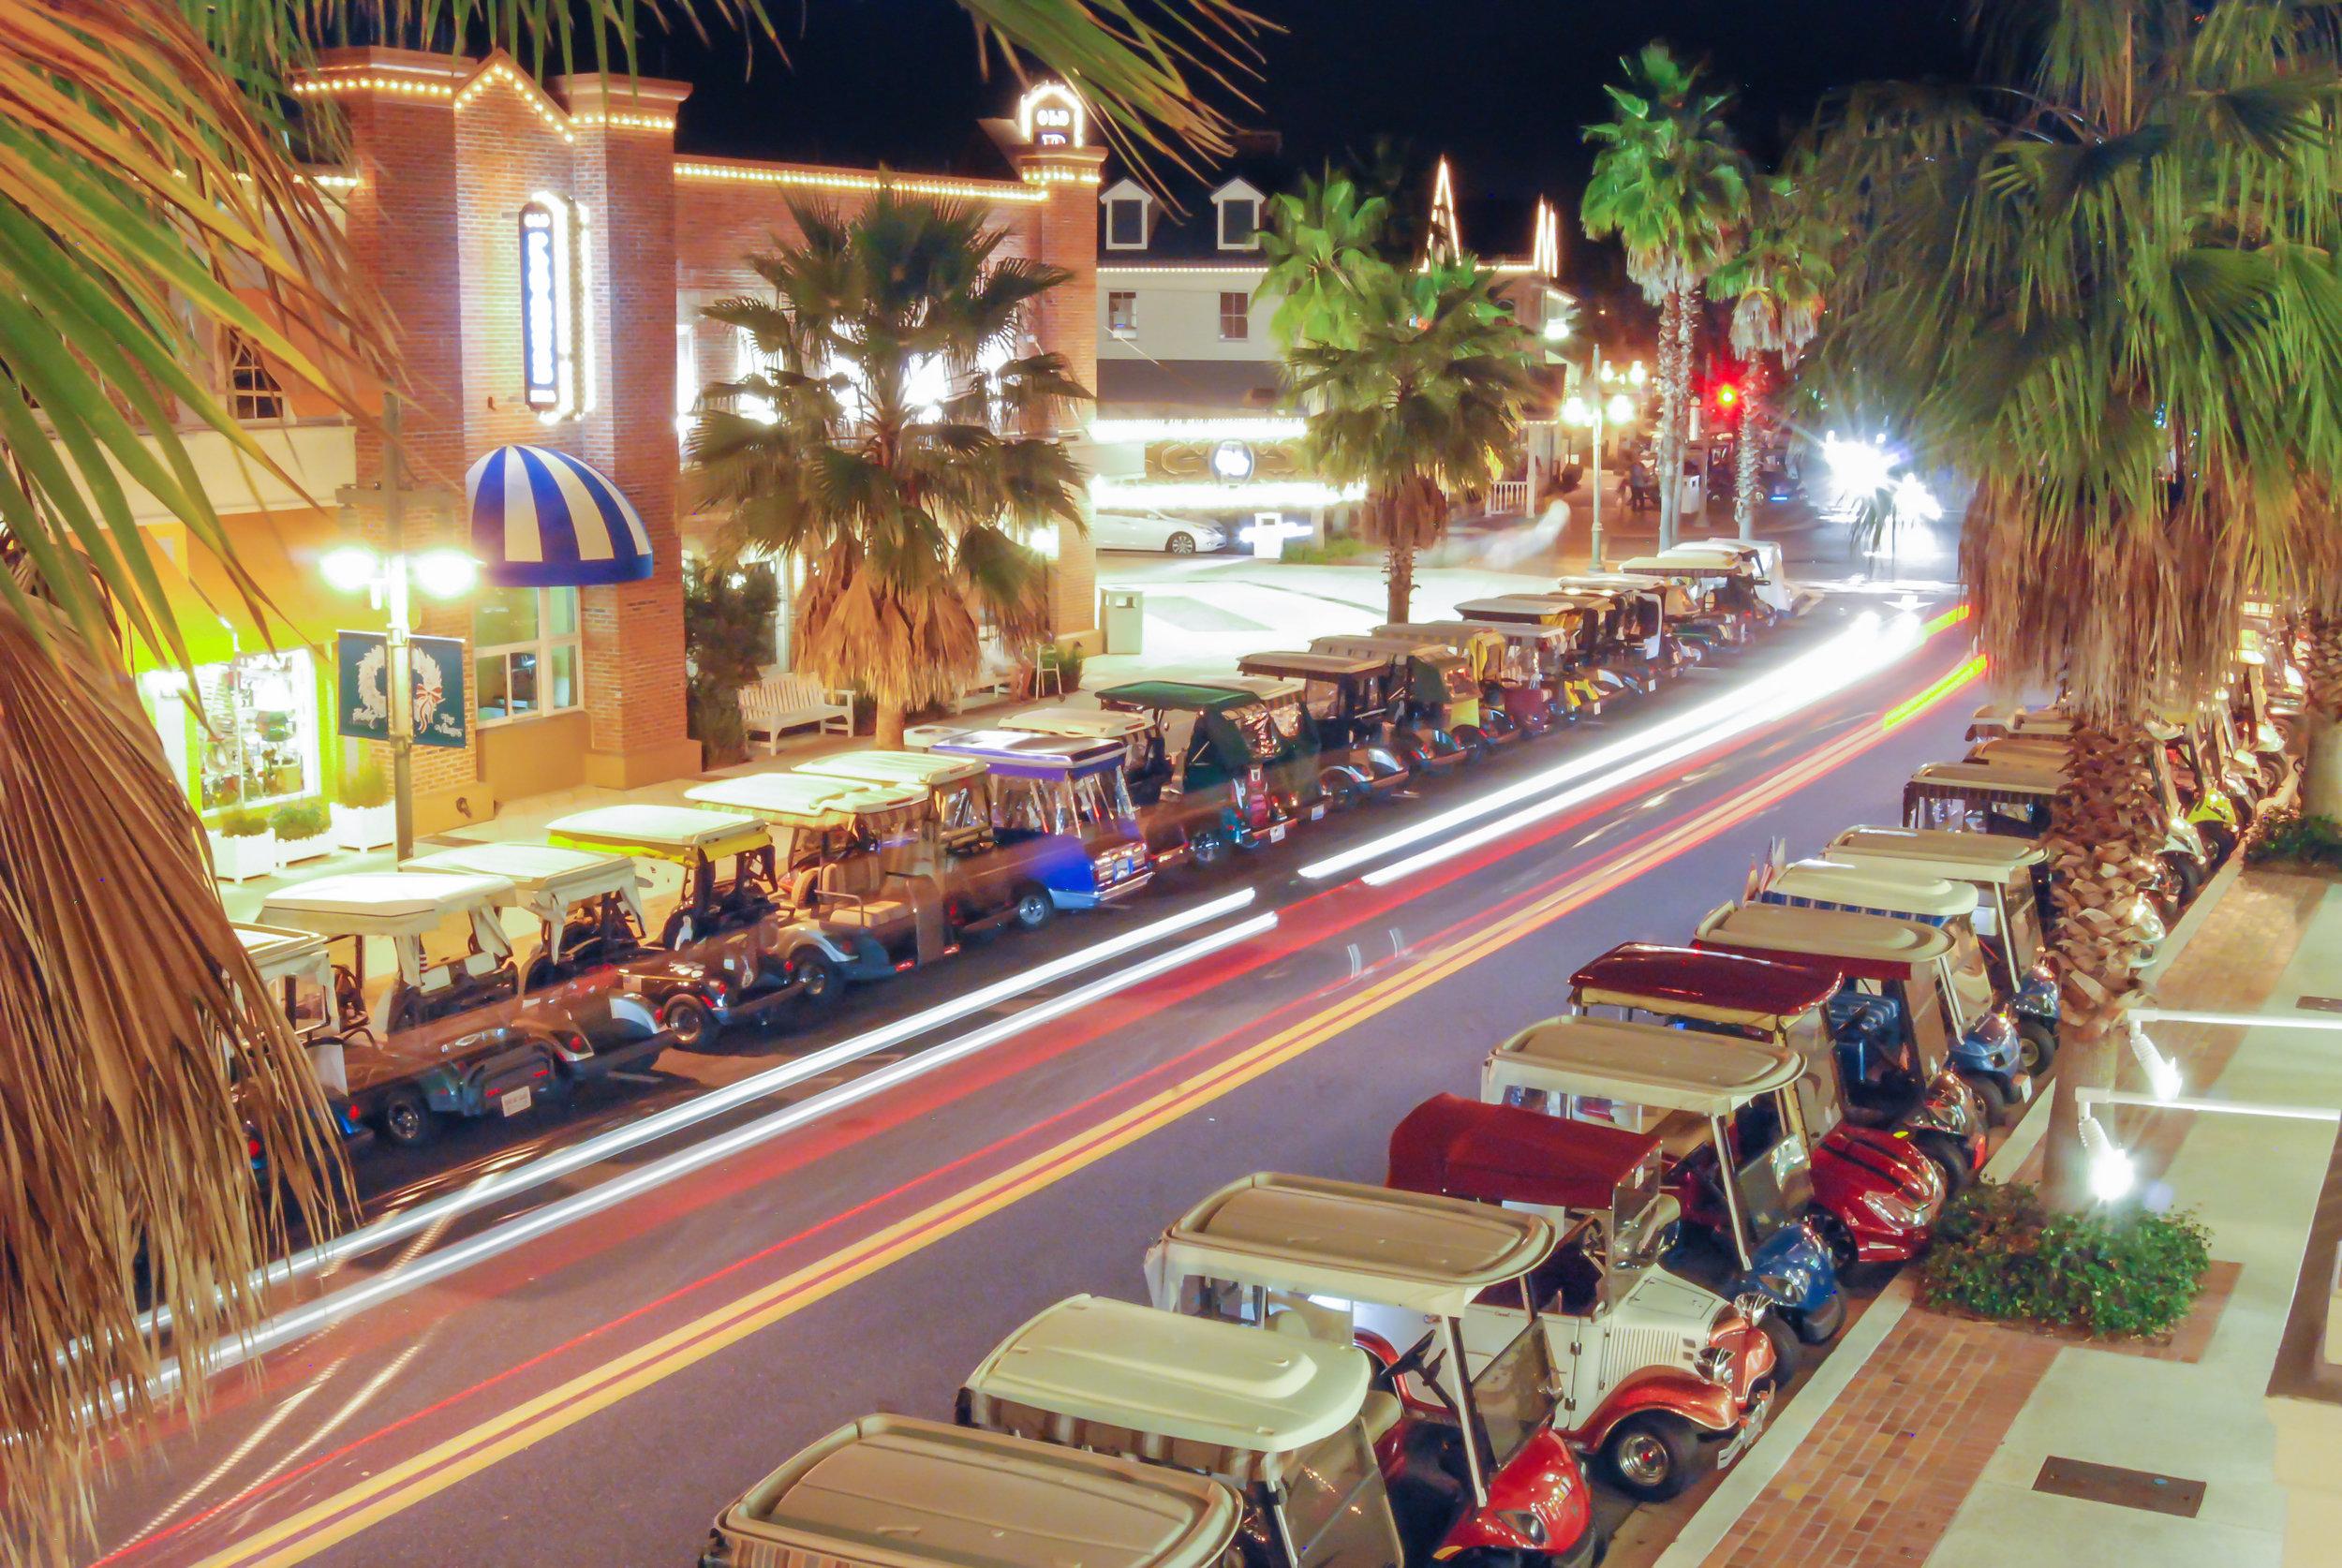 nightlife-the villages-florida-lake sumter-golf carts.jpg